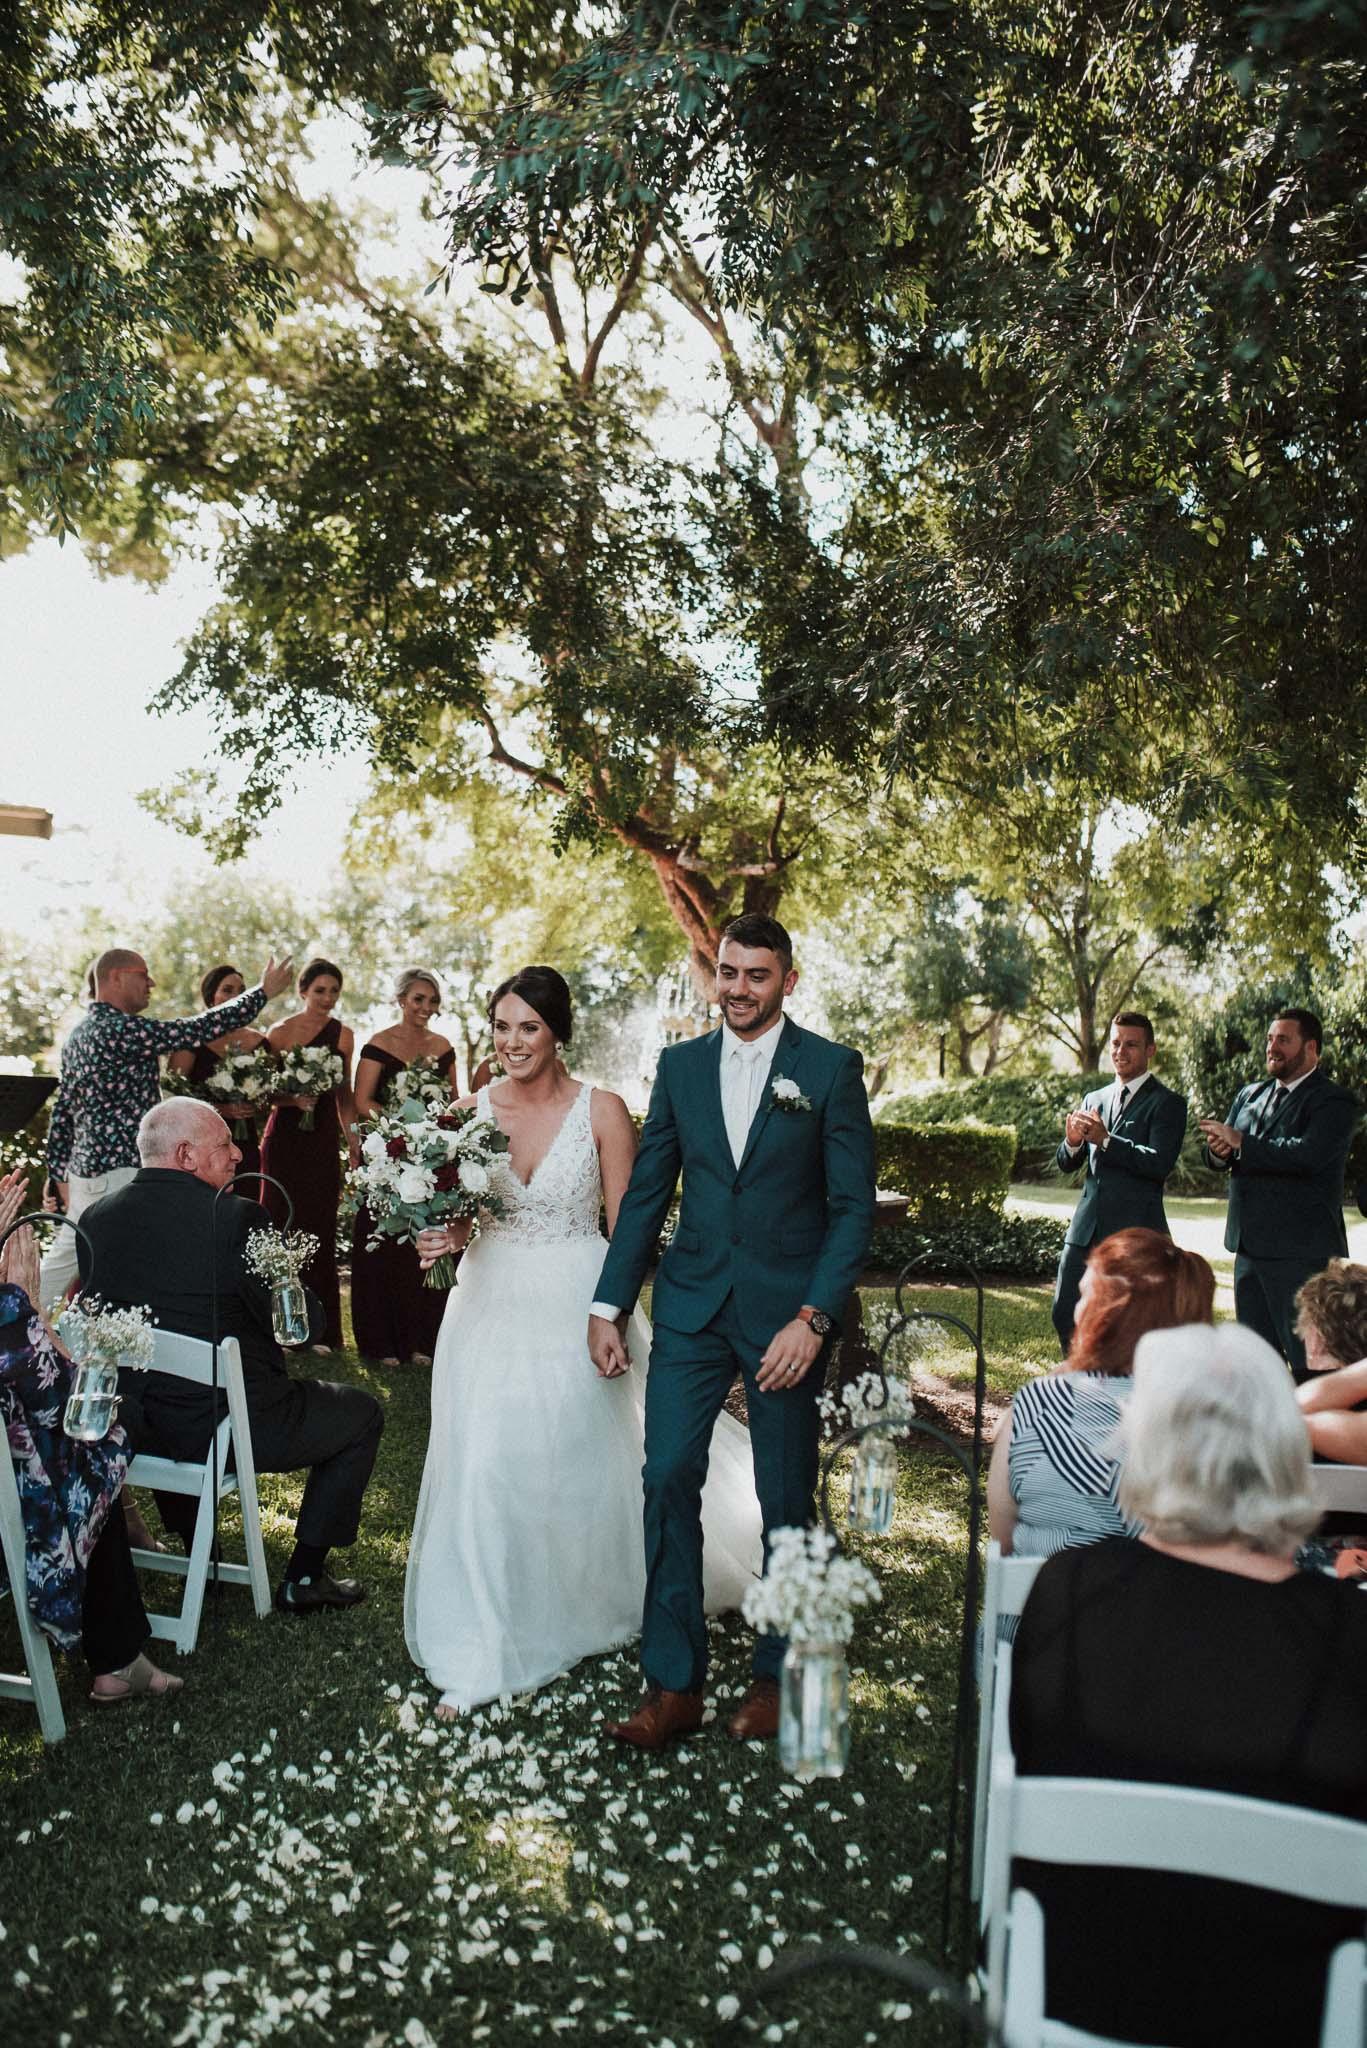 MECURE-RESORT-WEDDING-KING-WEB-101.jpg